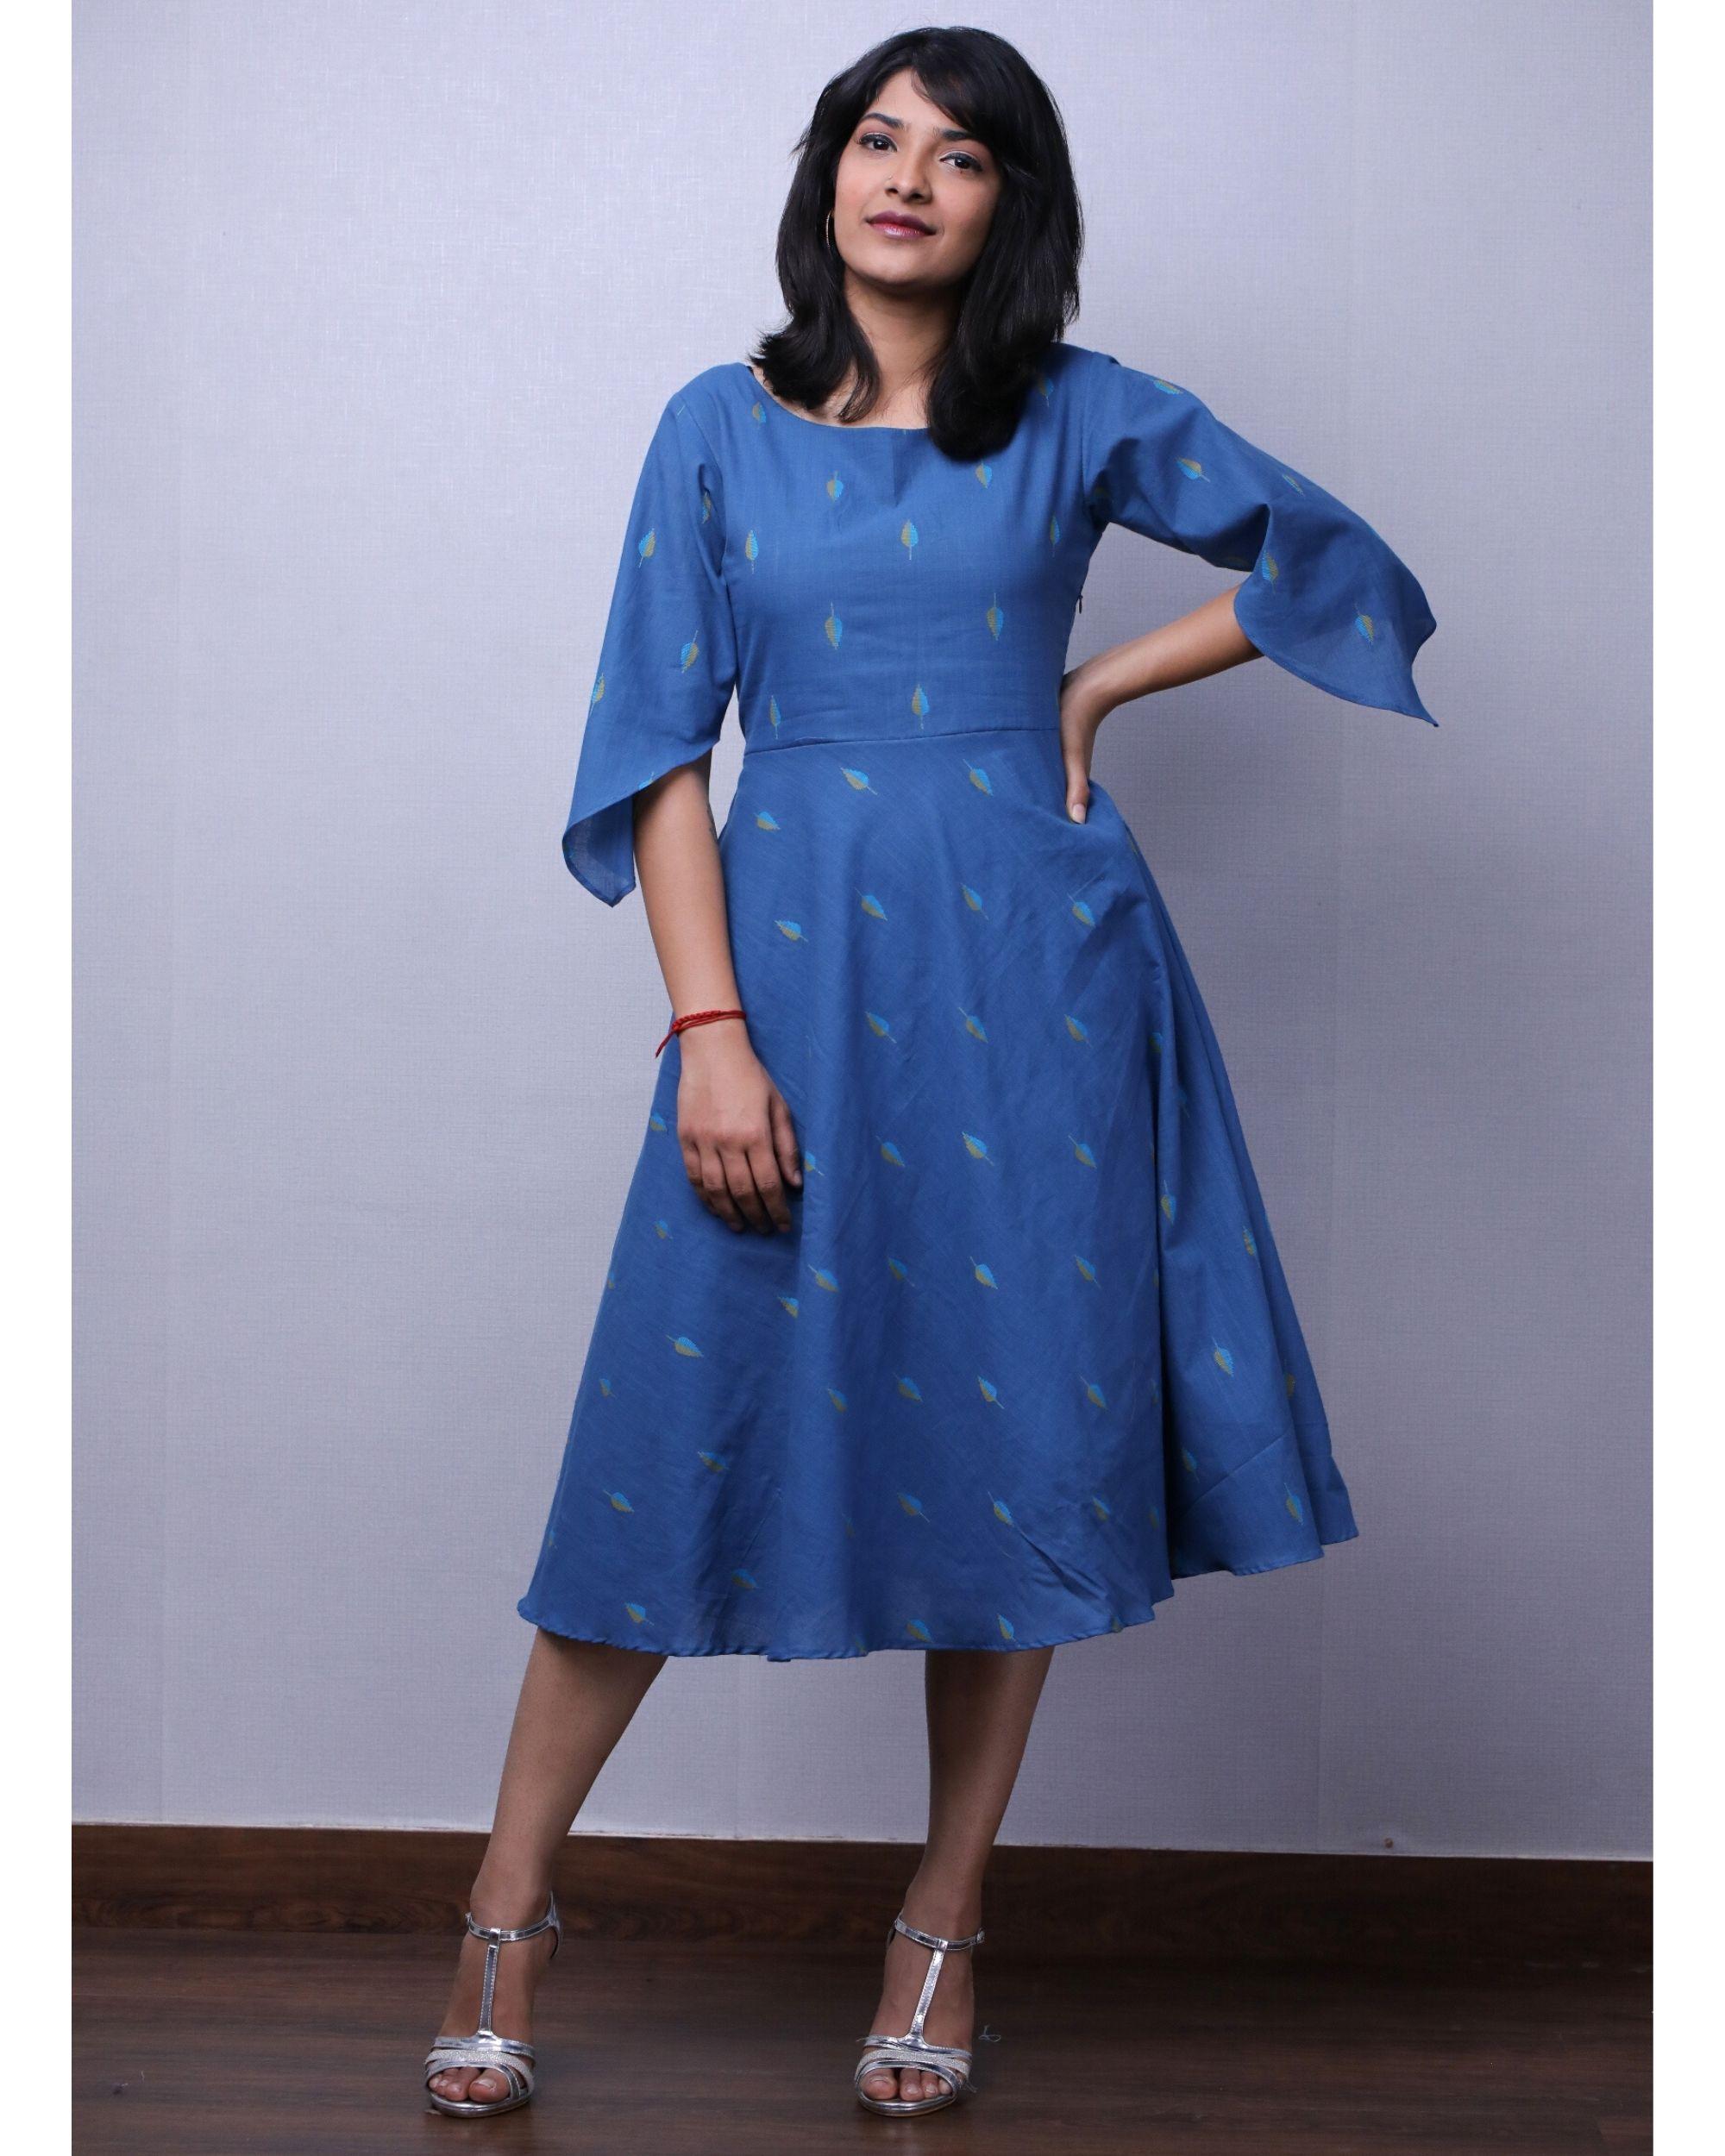 Blue jacquard printed short dress